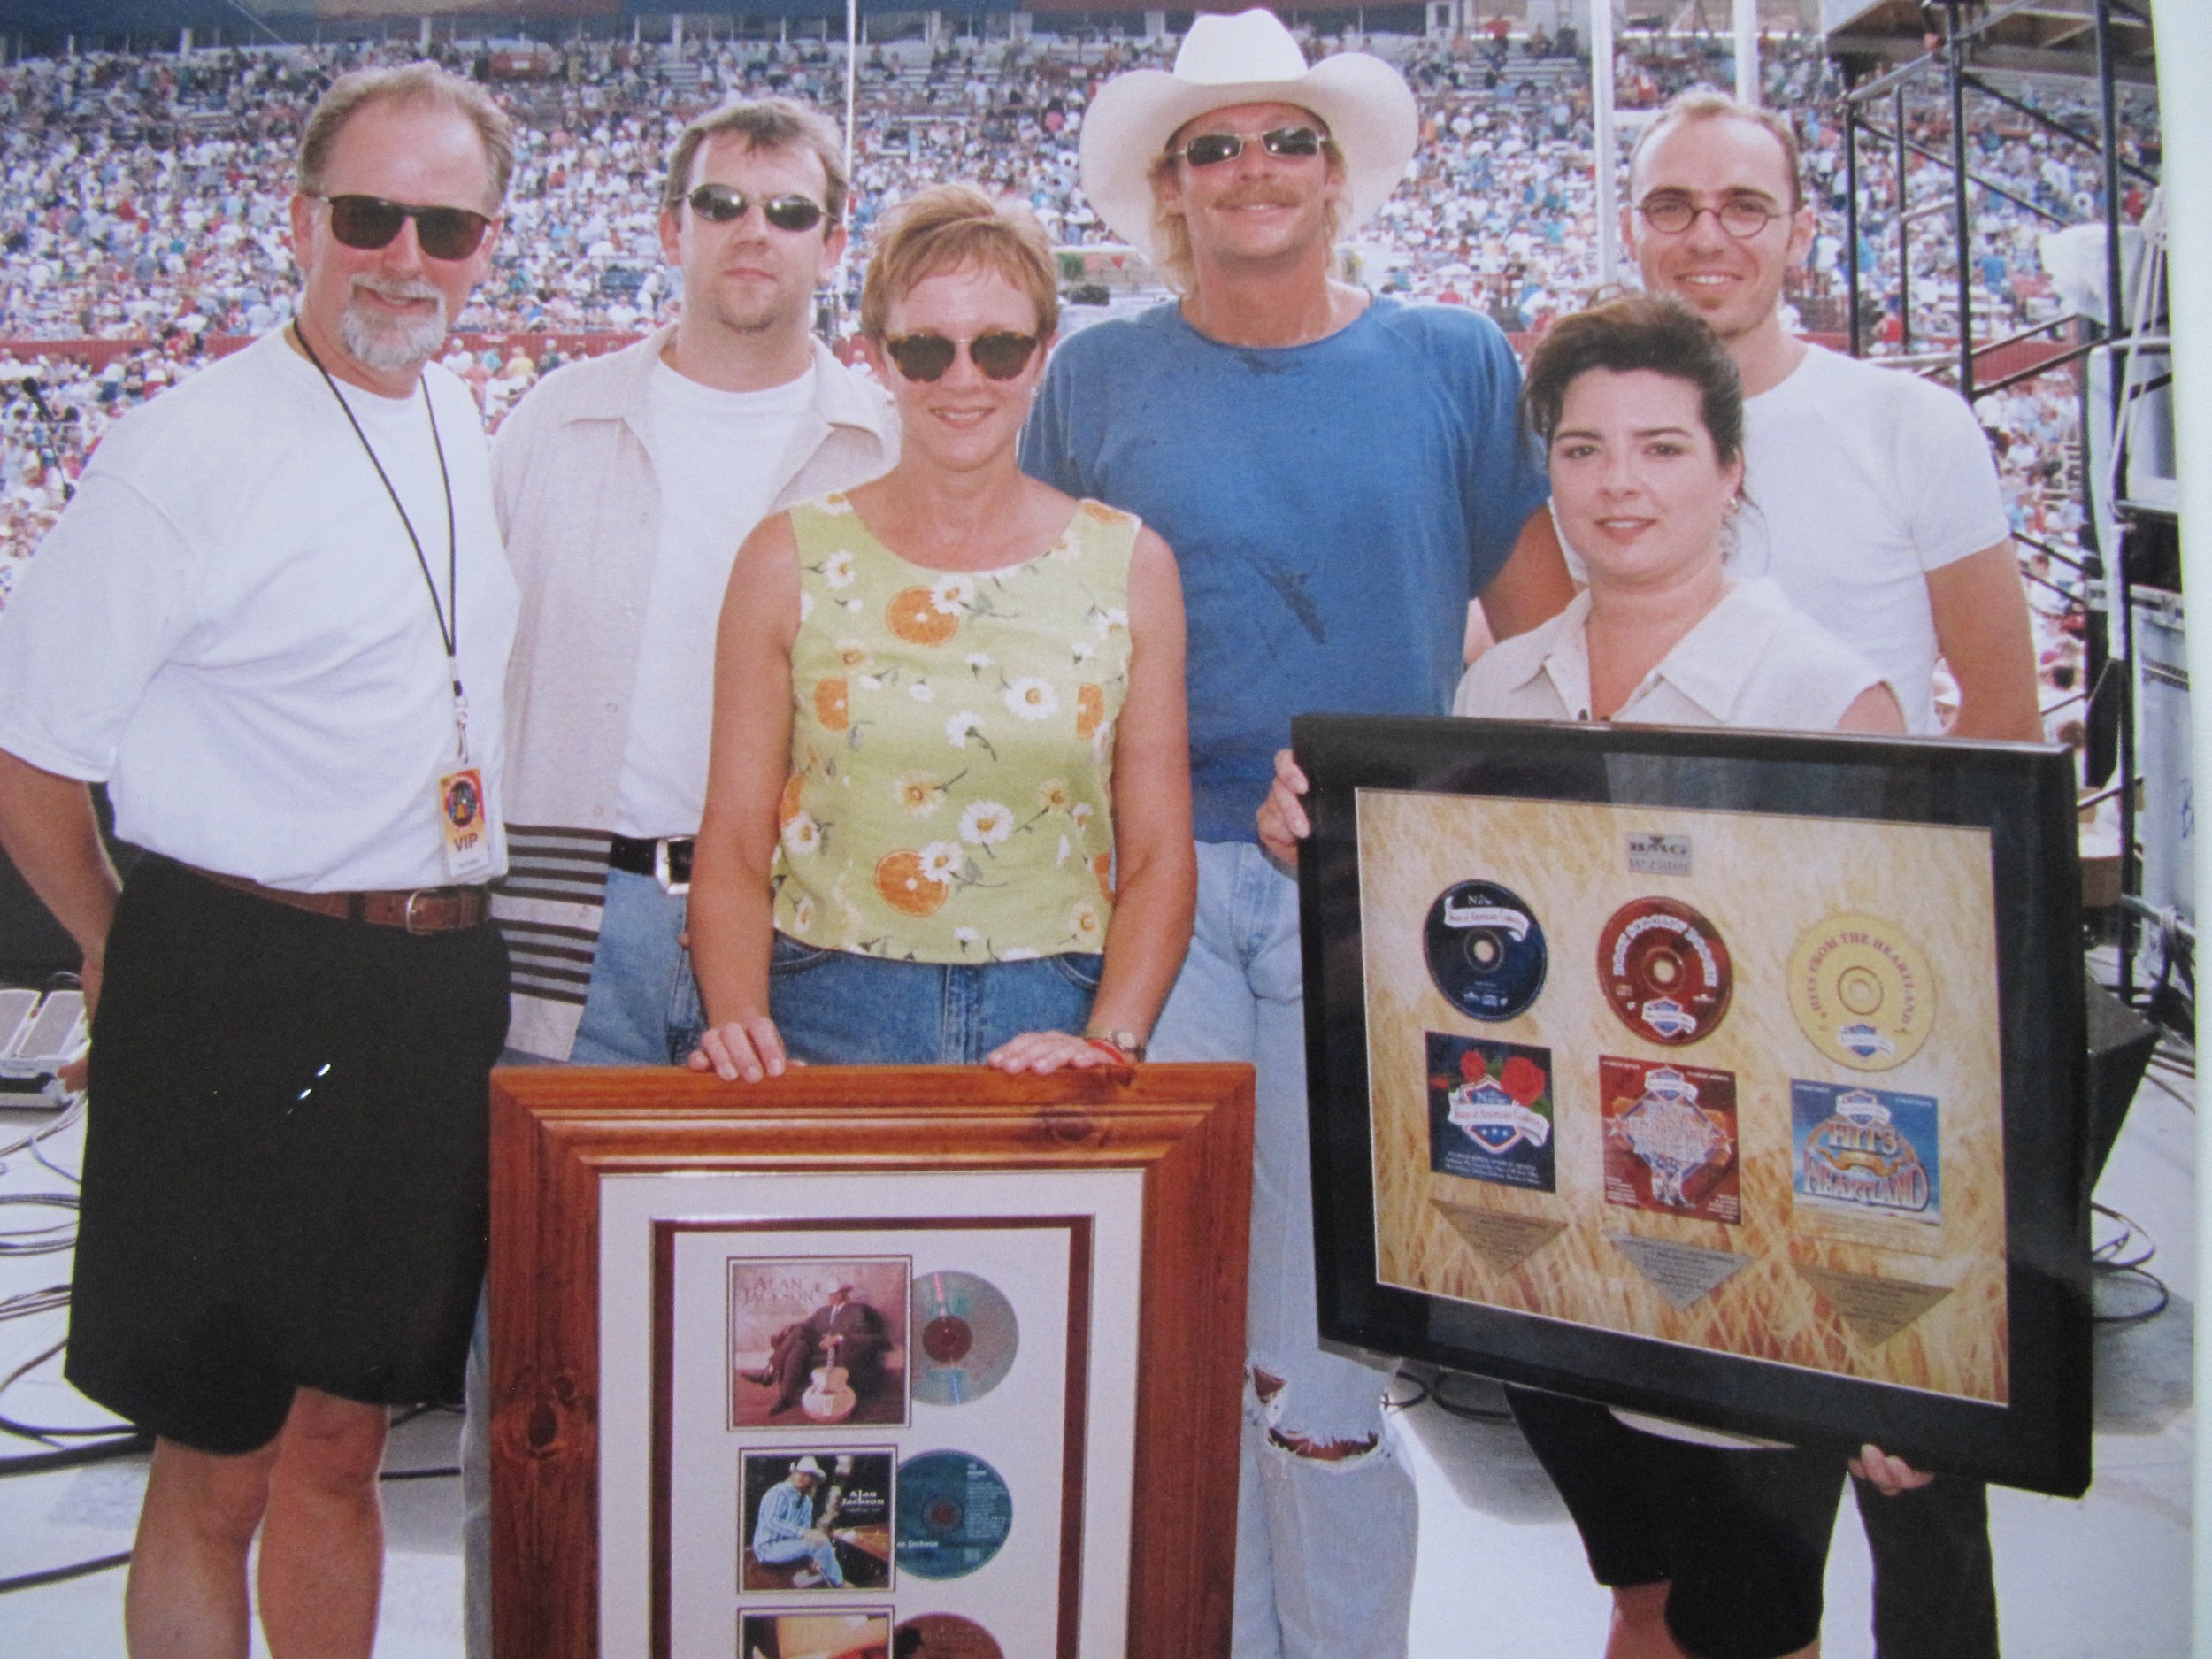 Richard BMG Australia, Ramona, Alan Jackson, Ann Holt BMG South Africa - gold and platinum sales awards presented at Arista Nashville Fan Fair 1995.JPG